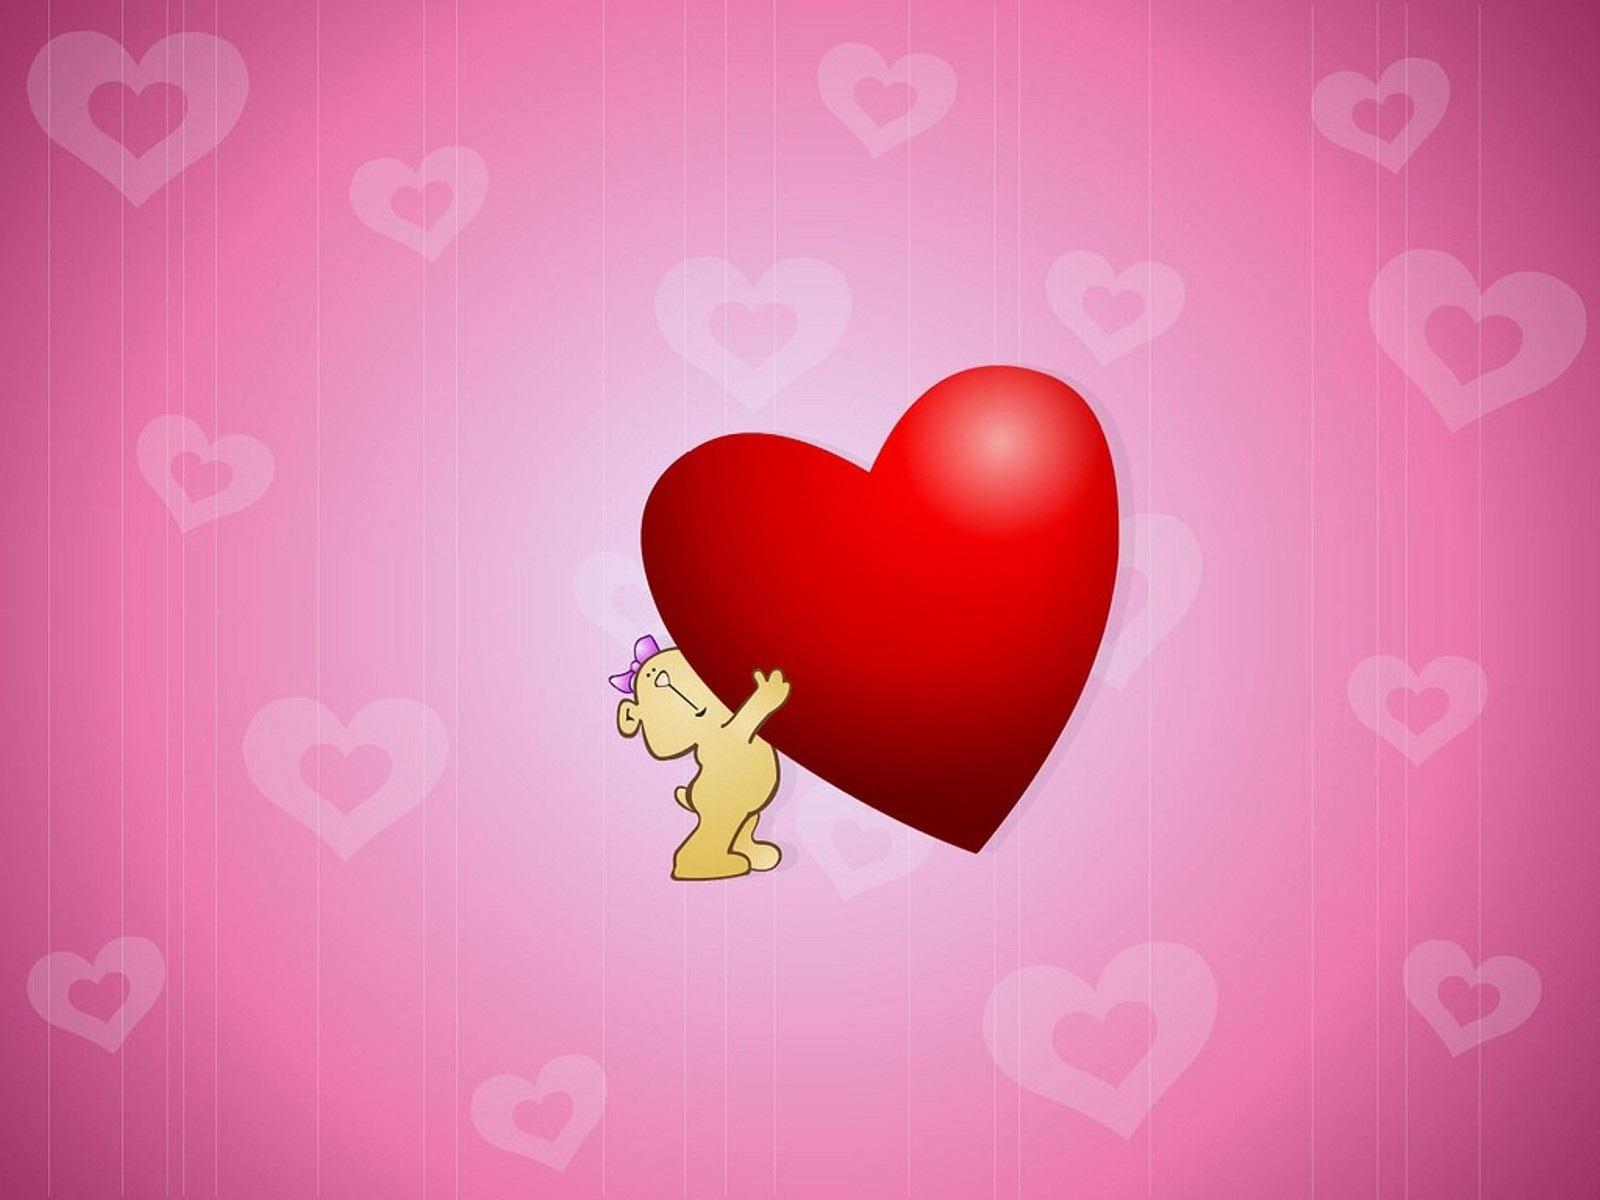 Cute Love Heart Wallpaper: Cute Hug Love Heart Wallpaper